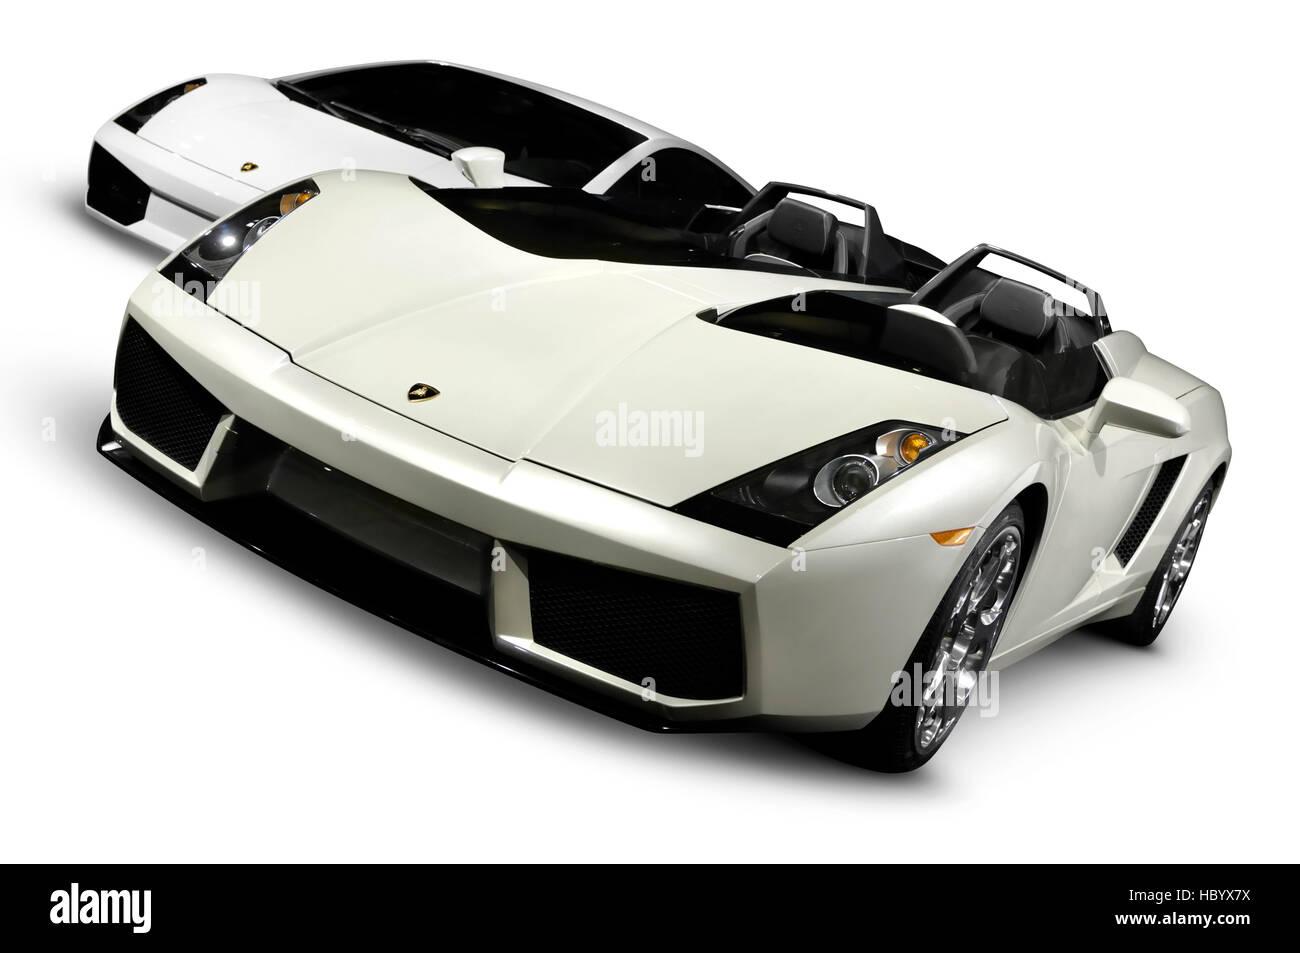 Lamborghini super cars 2005 Concept S and 2007 Gallardo Superleggera - Stock Image